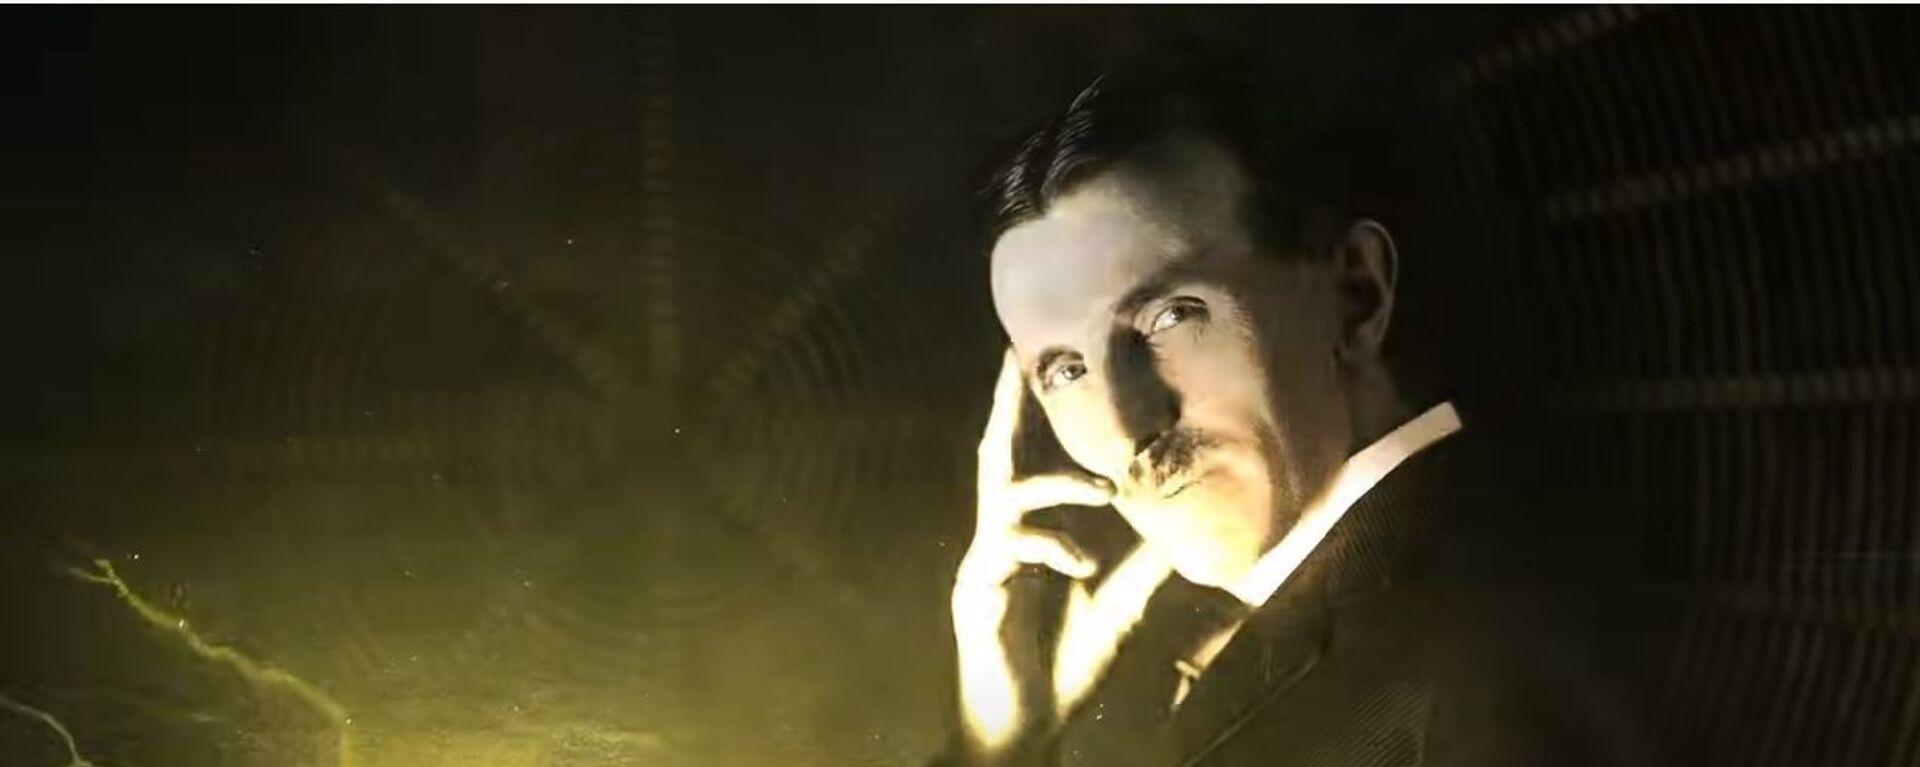 Никола Тесла - Sputnik Србија, 1920, 29.04.2021